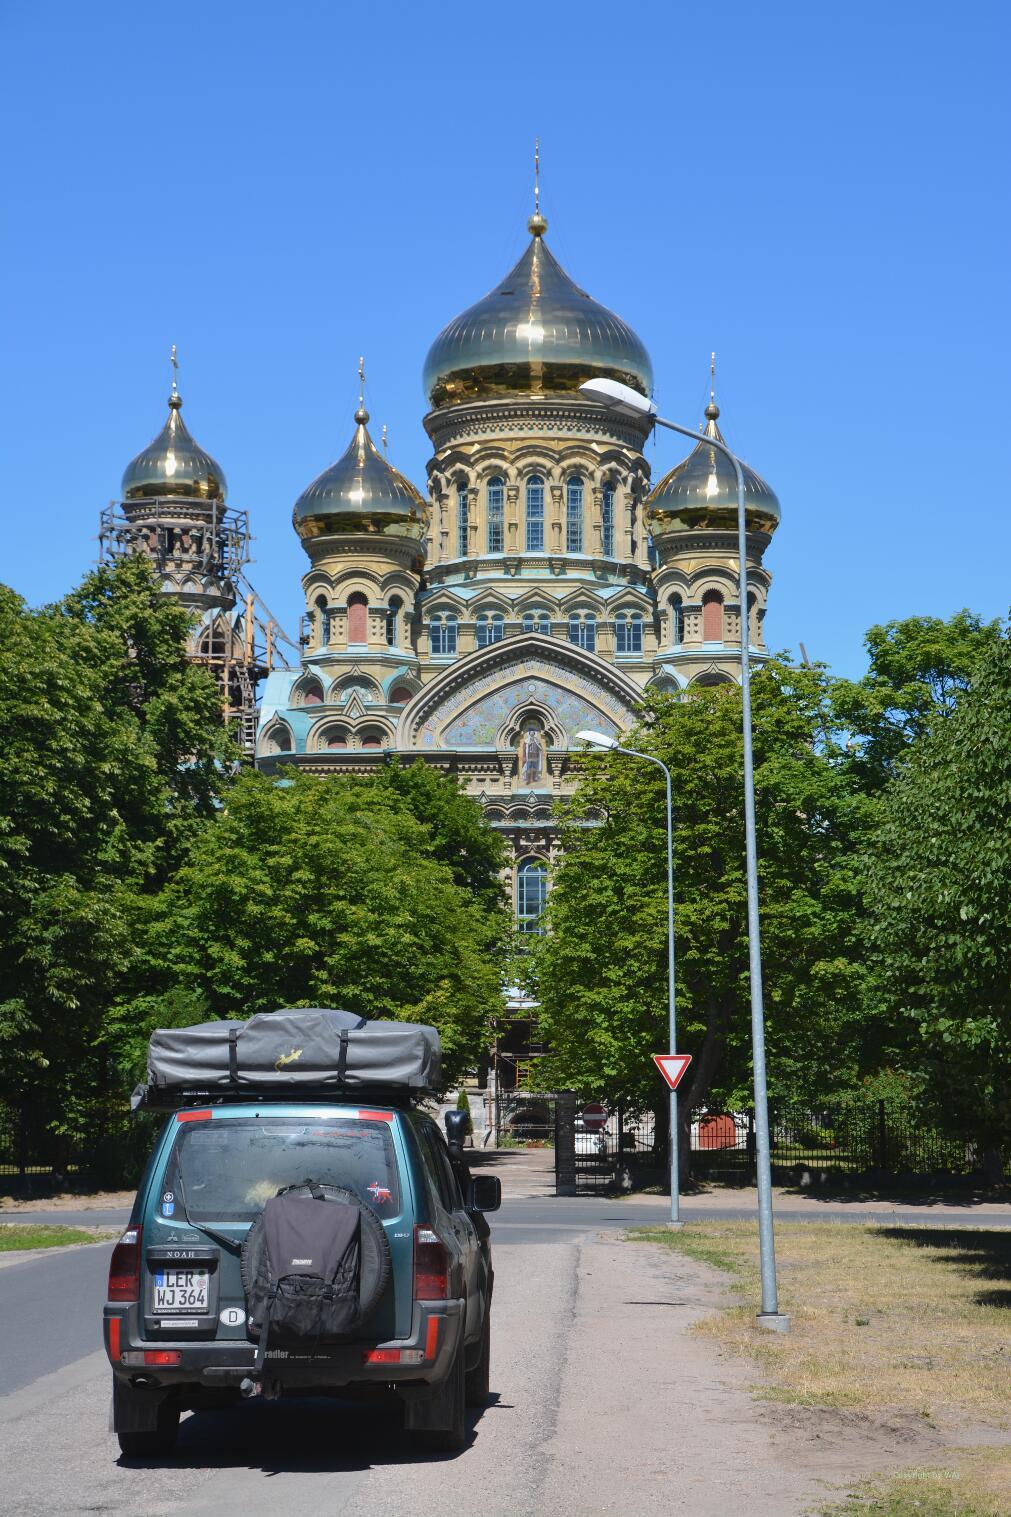 Orthodoxe Dreifaltigkeitskathedrale in Liepaja